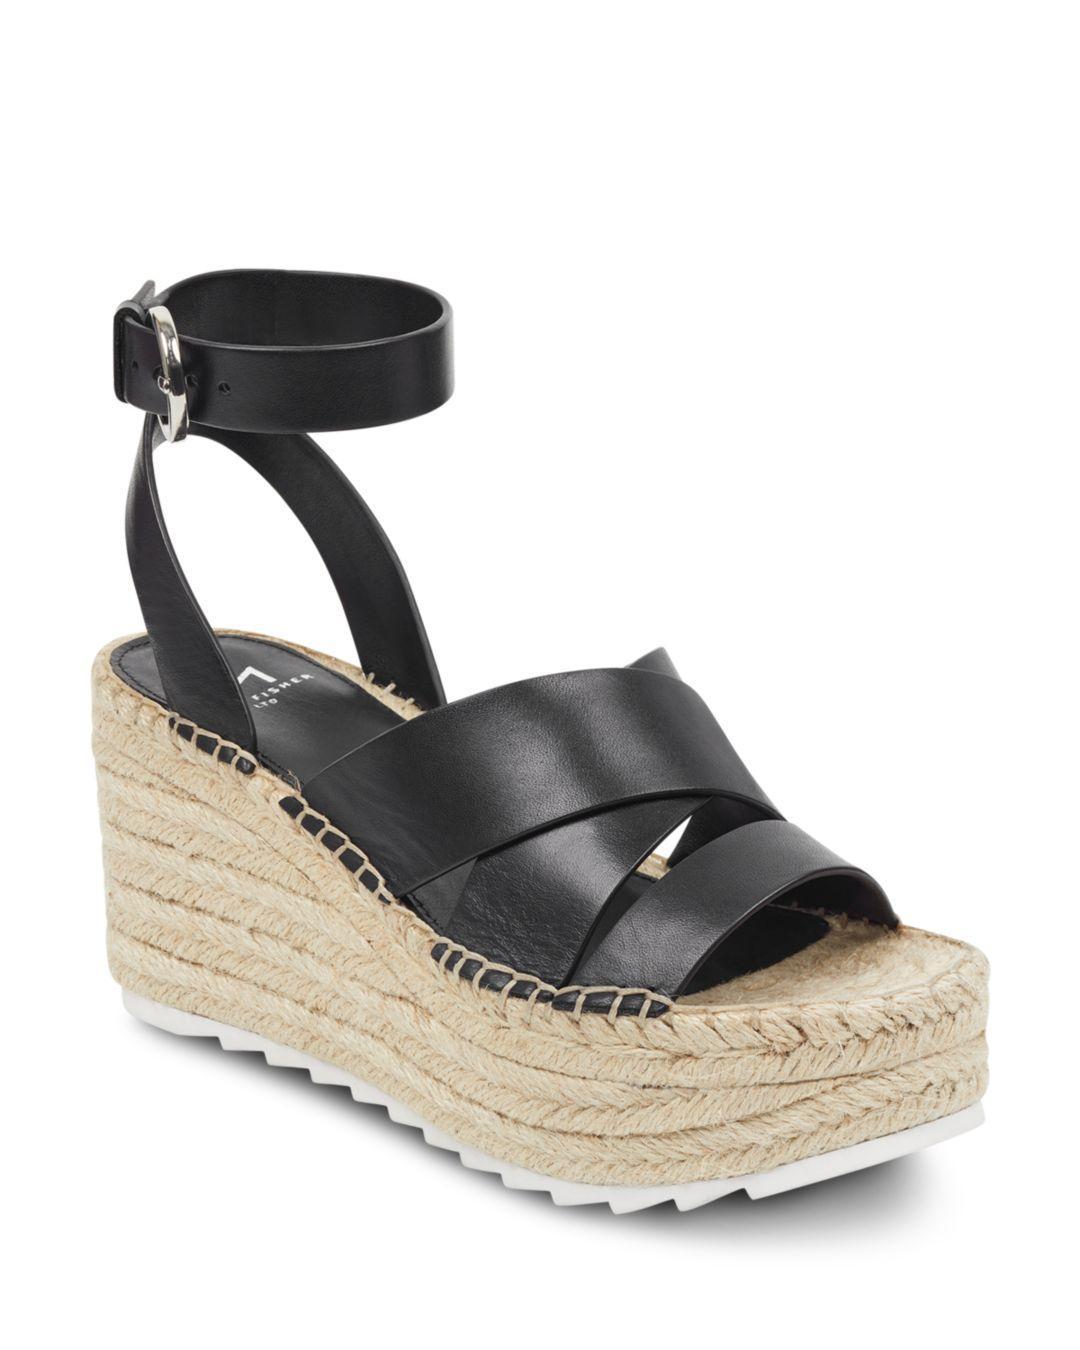 e9a623671fe Black Women's Raffa Espadrille Platform Wedge Sandals